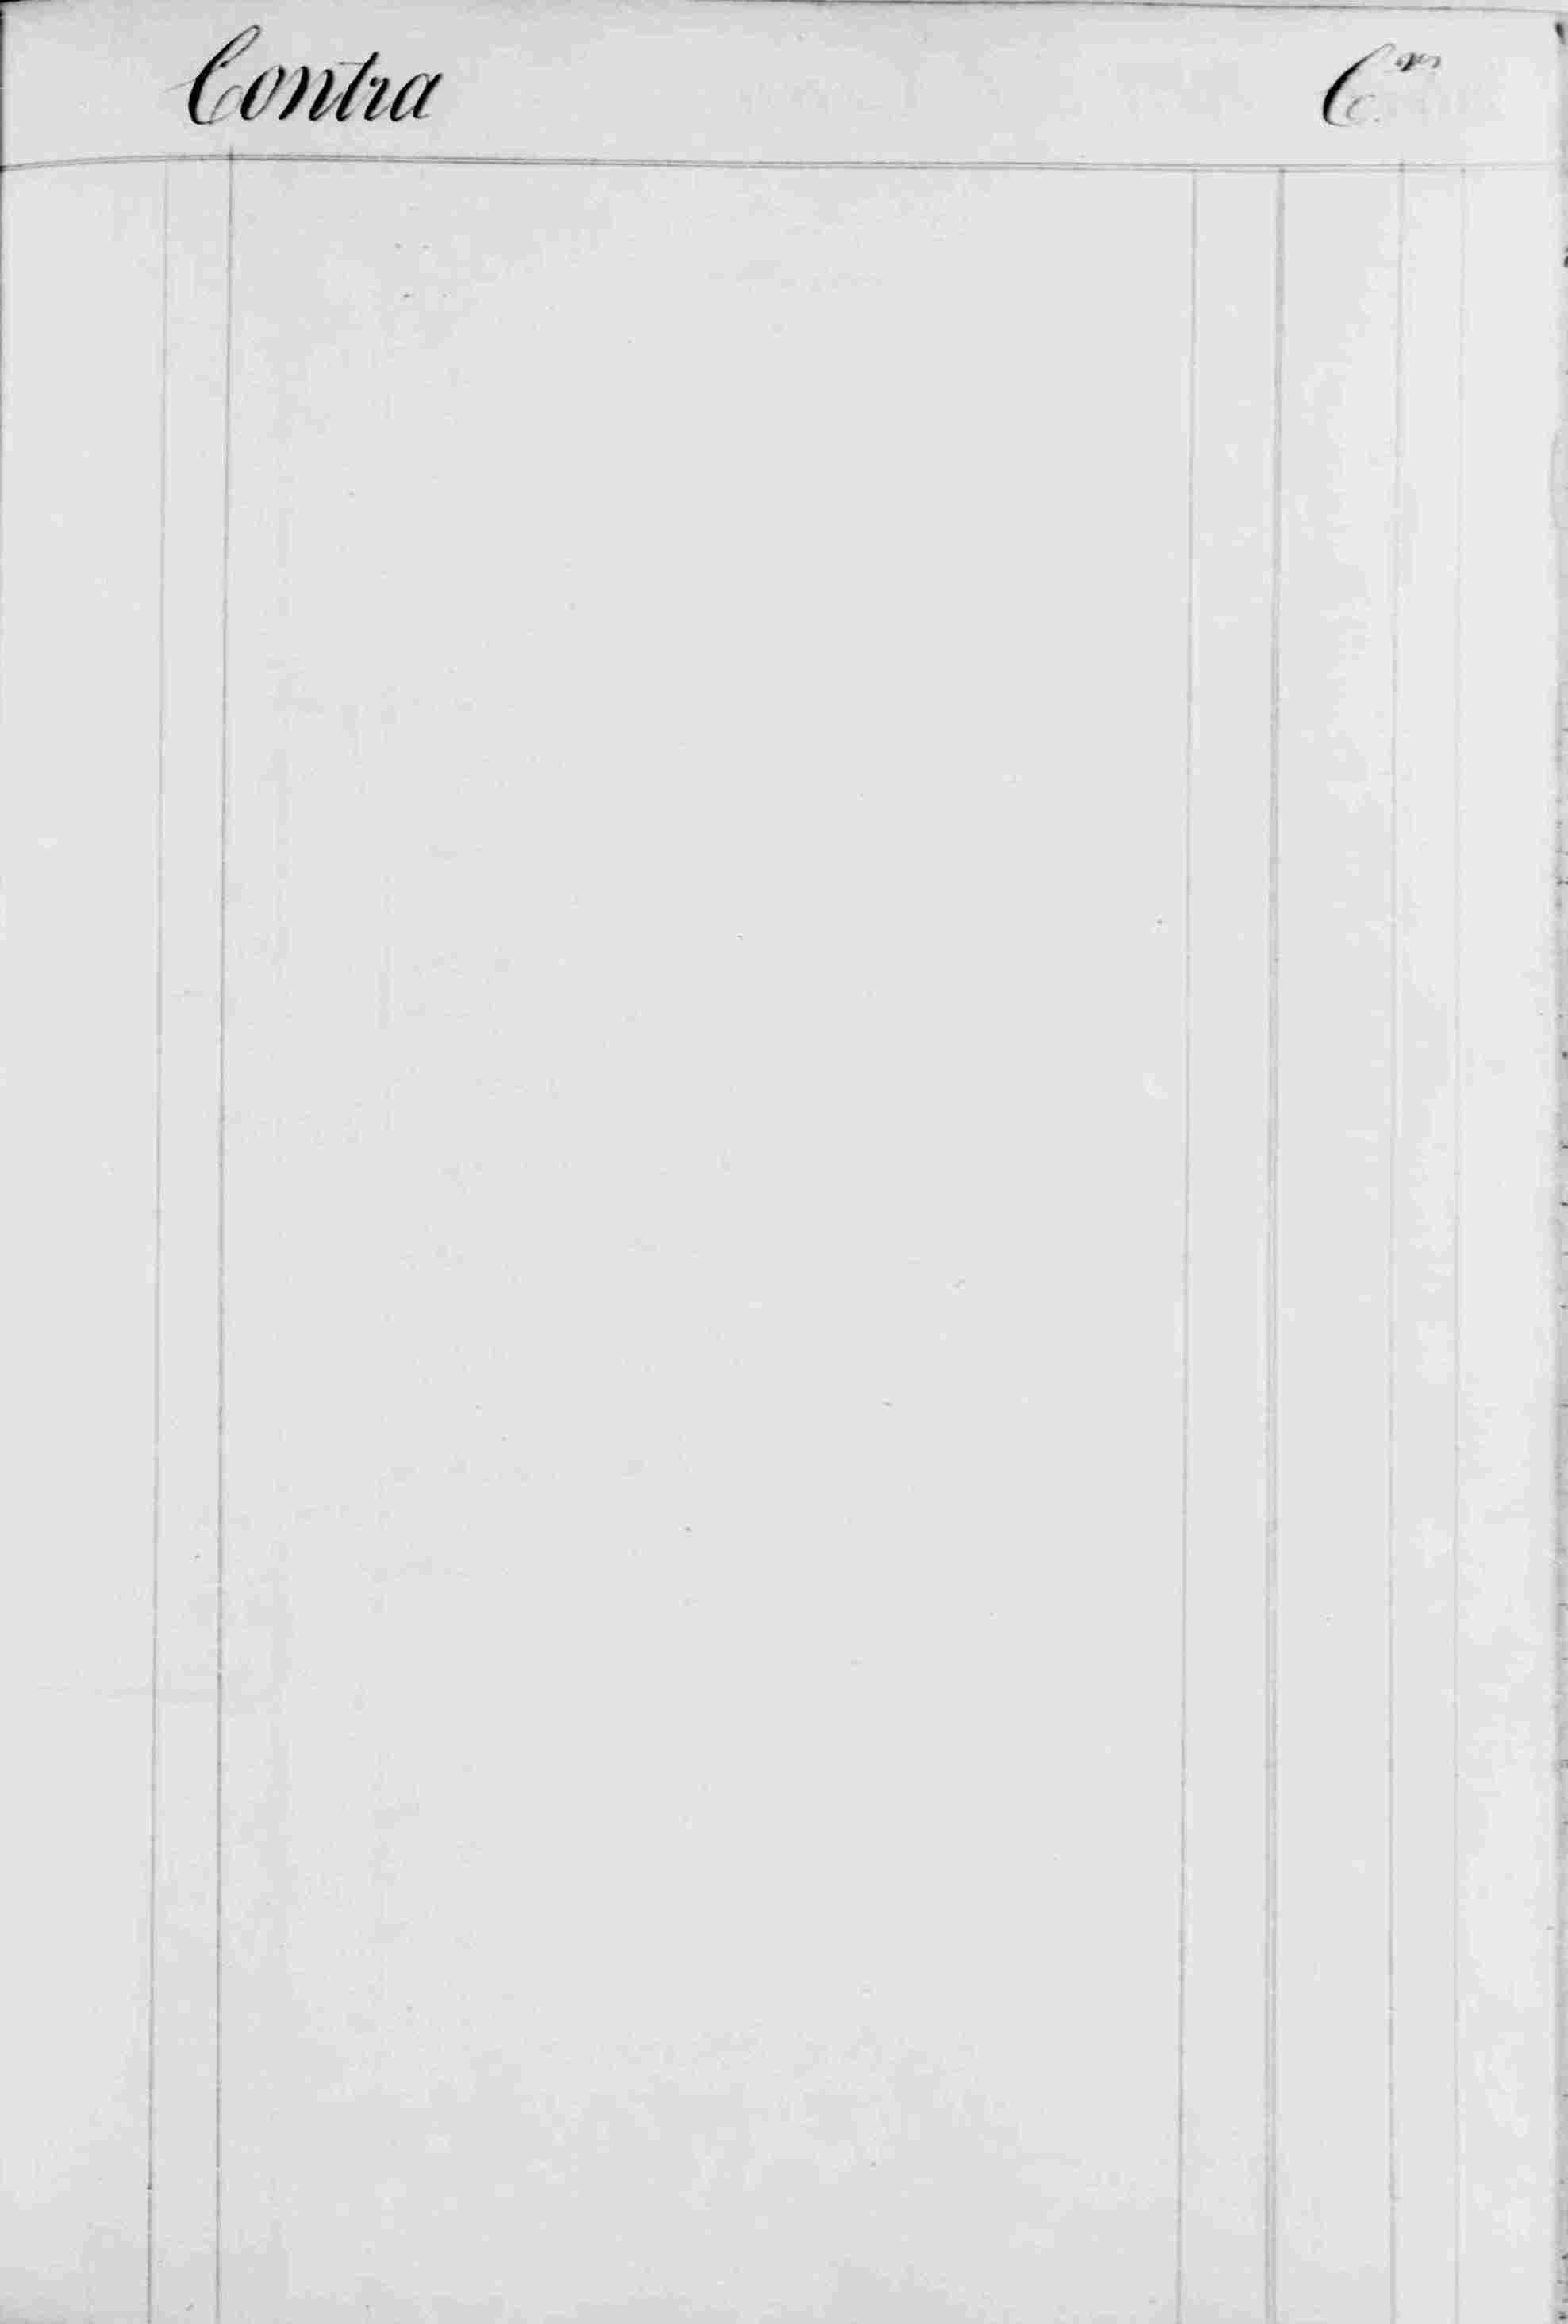 Ledger B, folio 298, right side